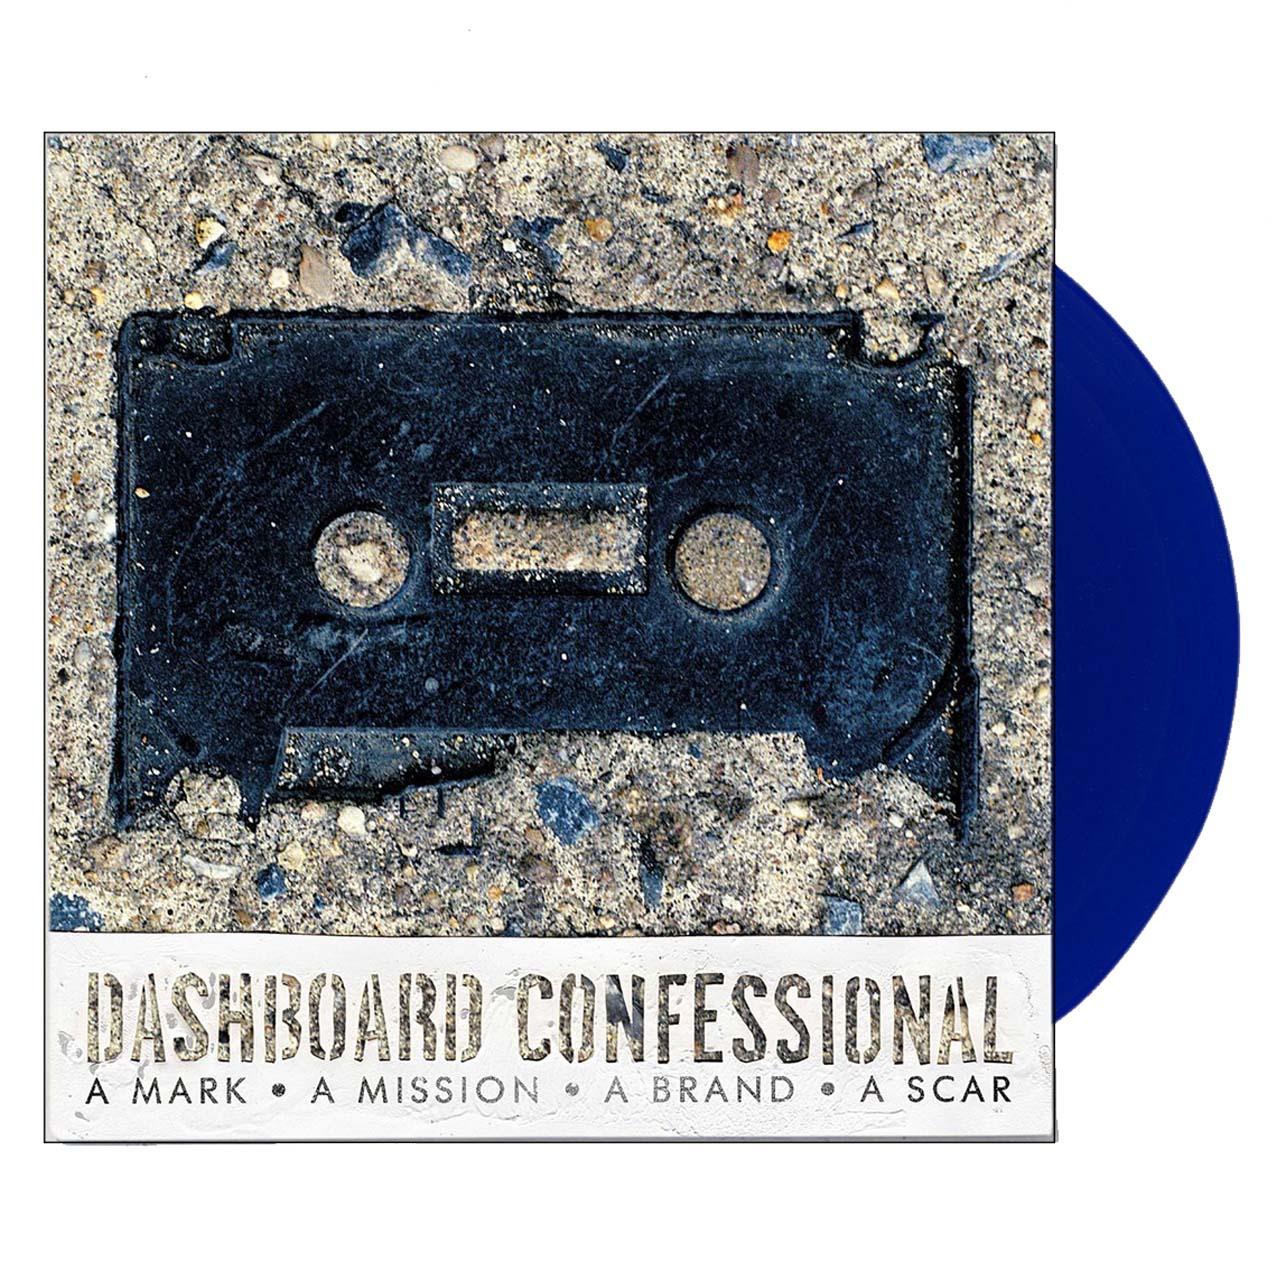 DASHBOARD CONFESSIONAL A Mark A Mission A Brand A Scar Vinyl